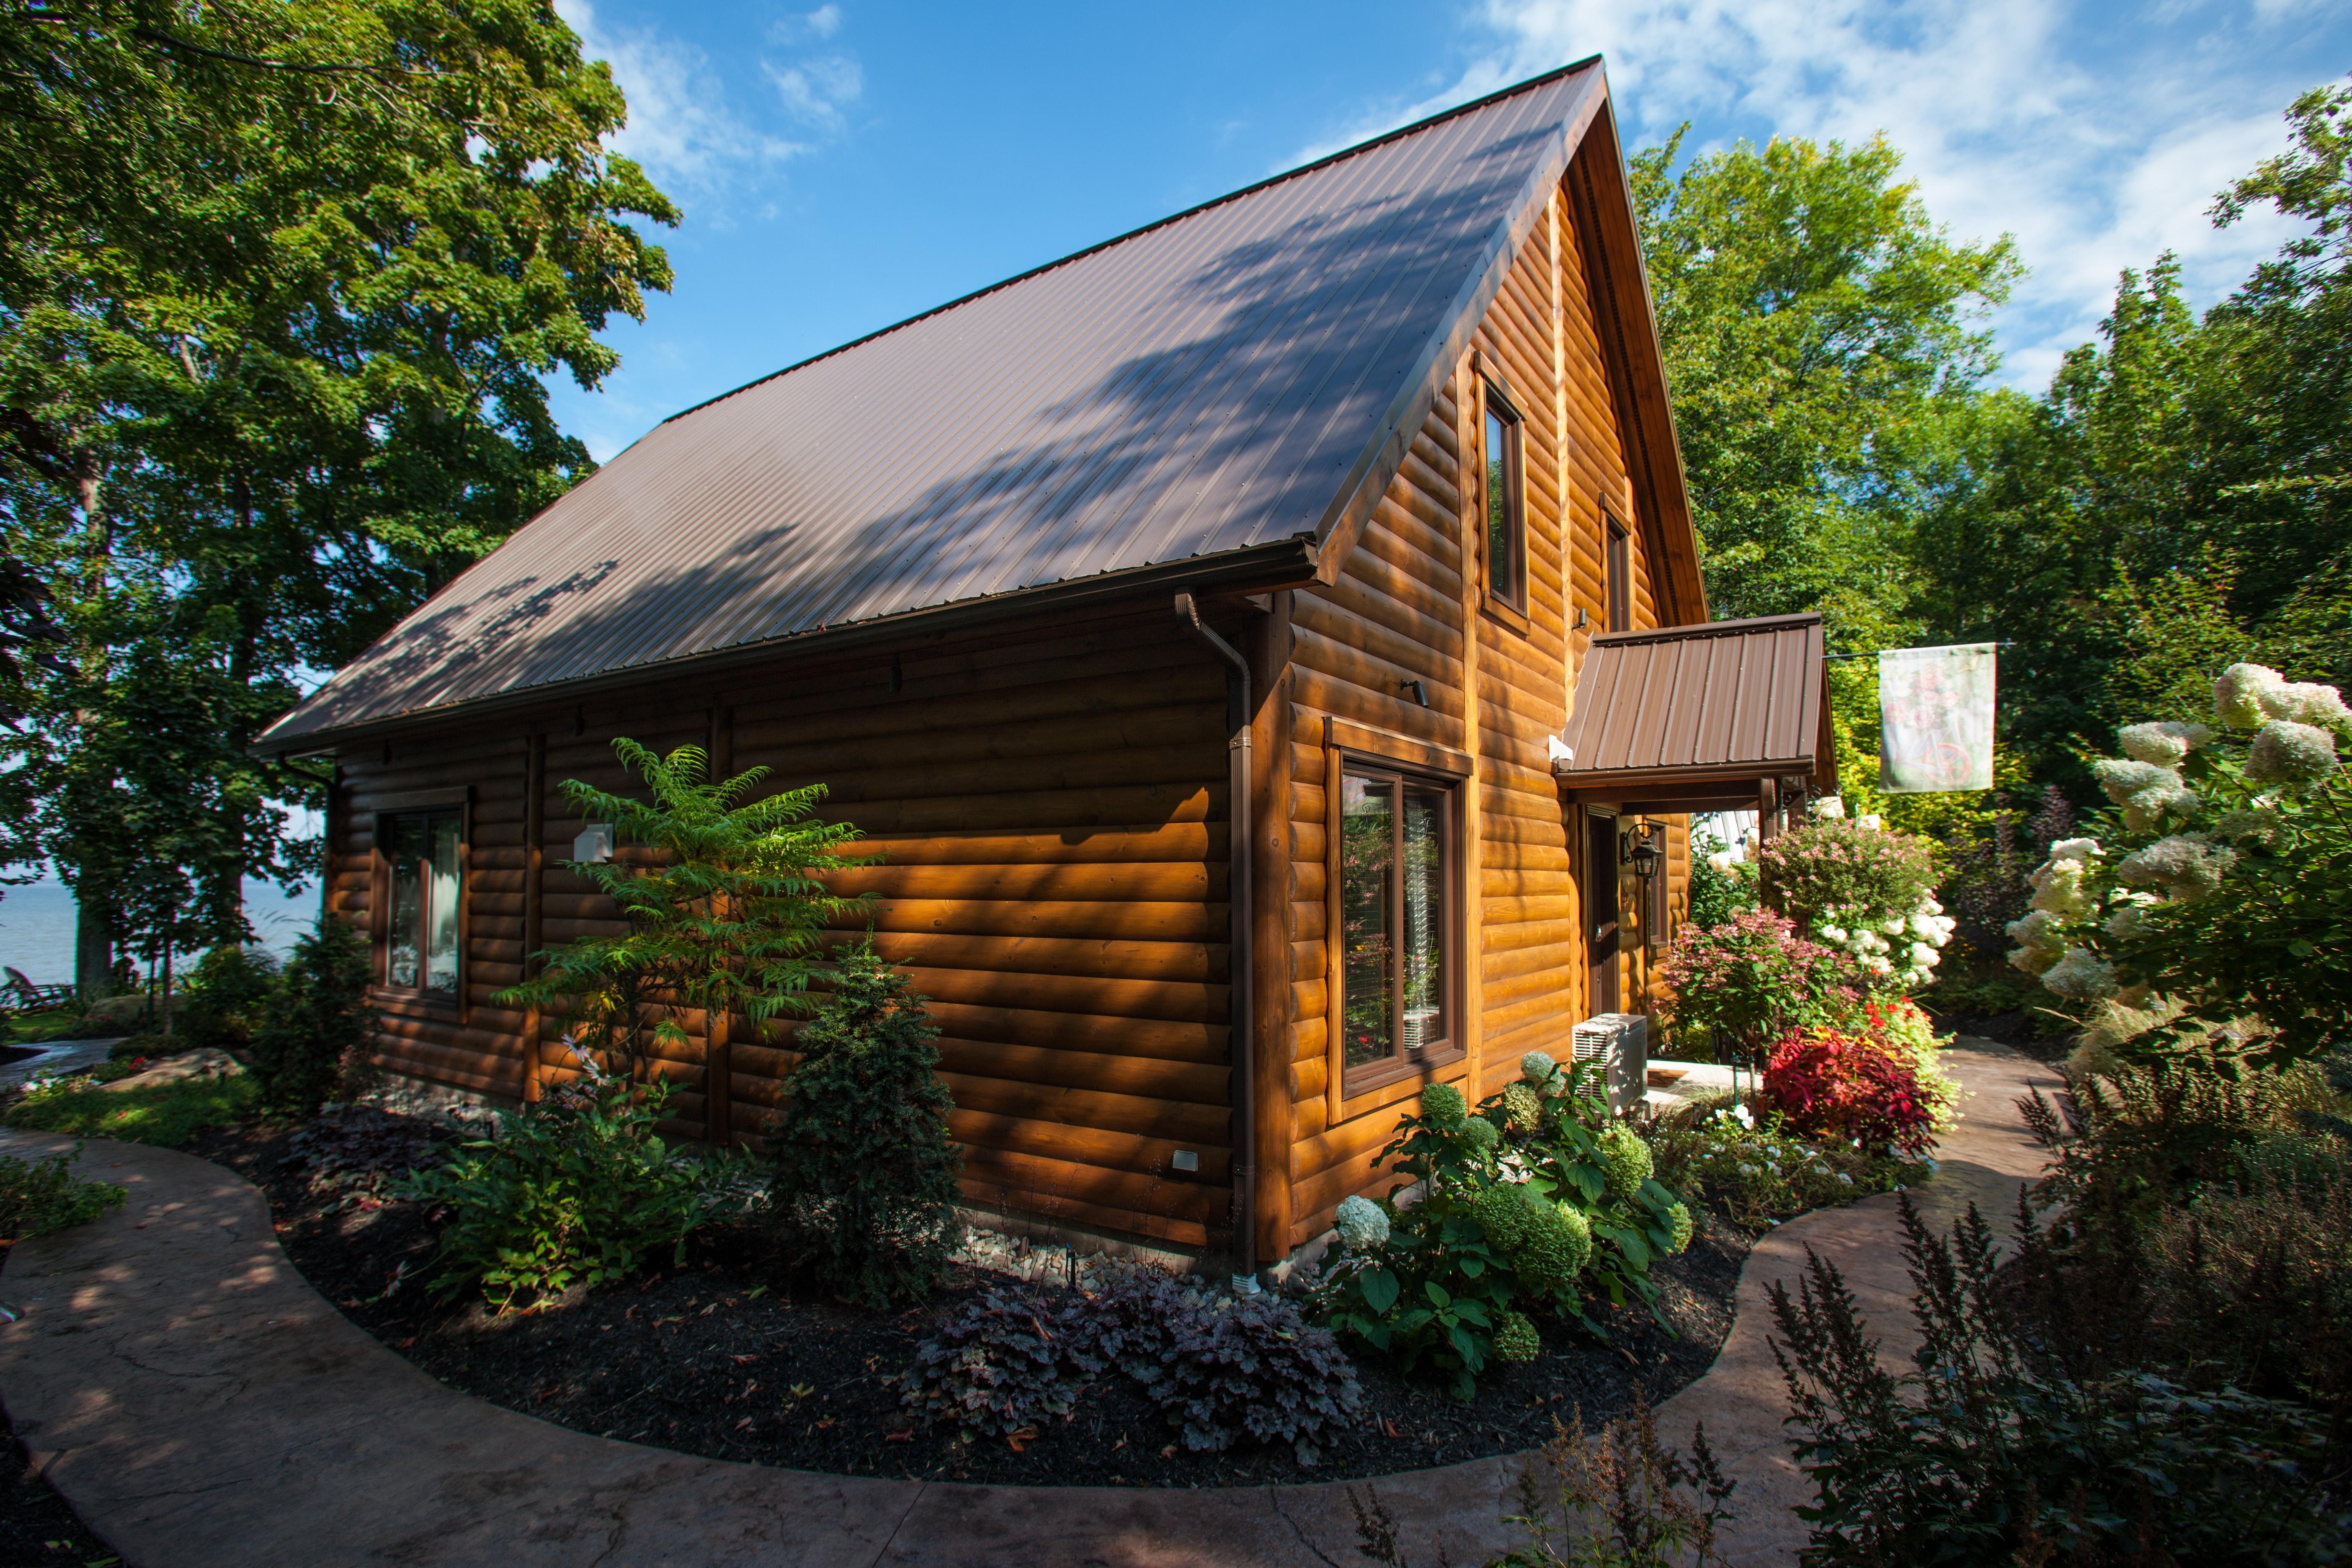 Timber Block engineered prefab homes